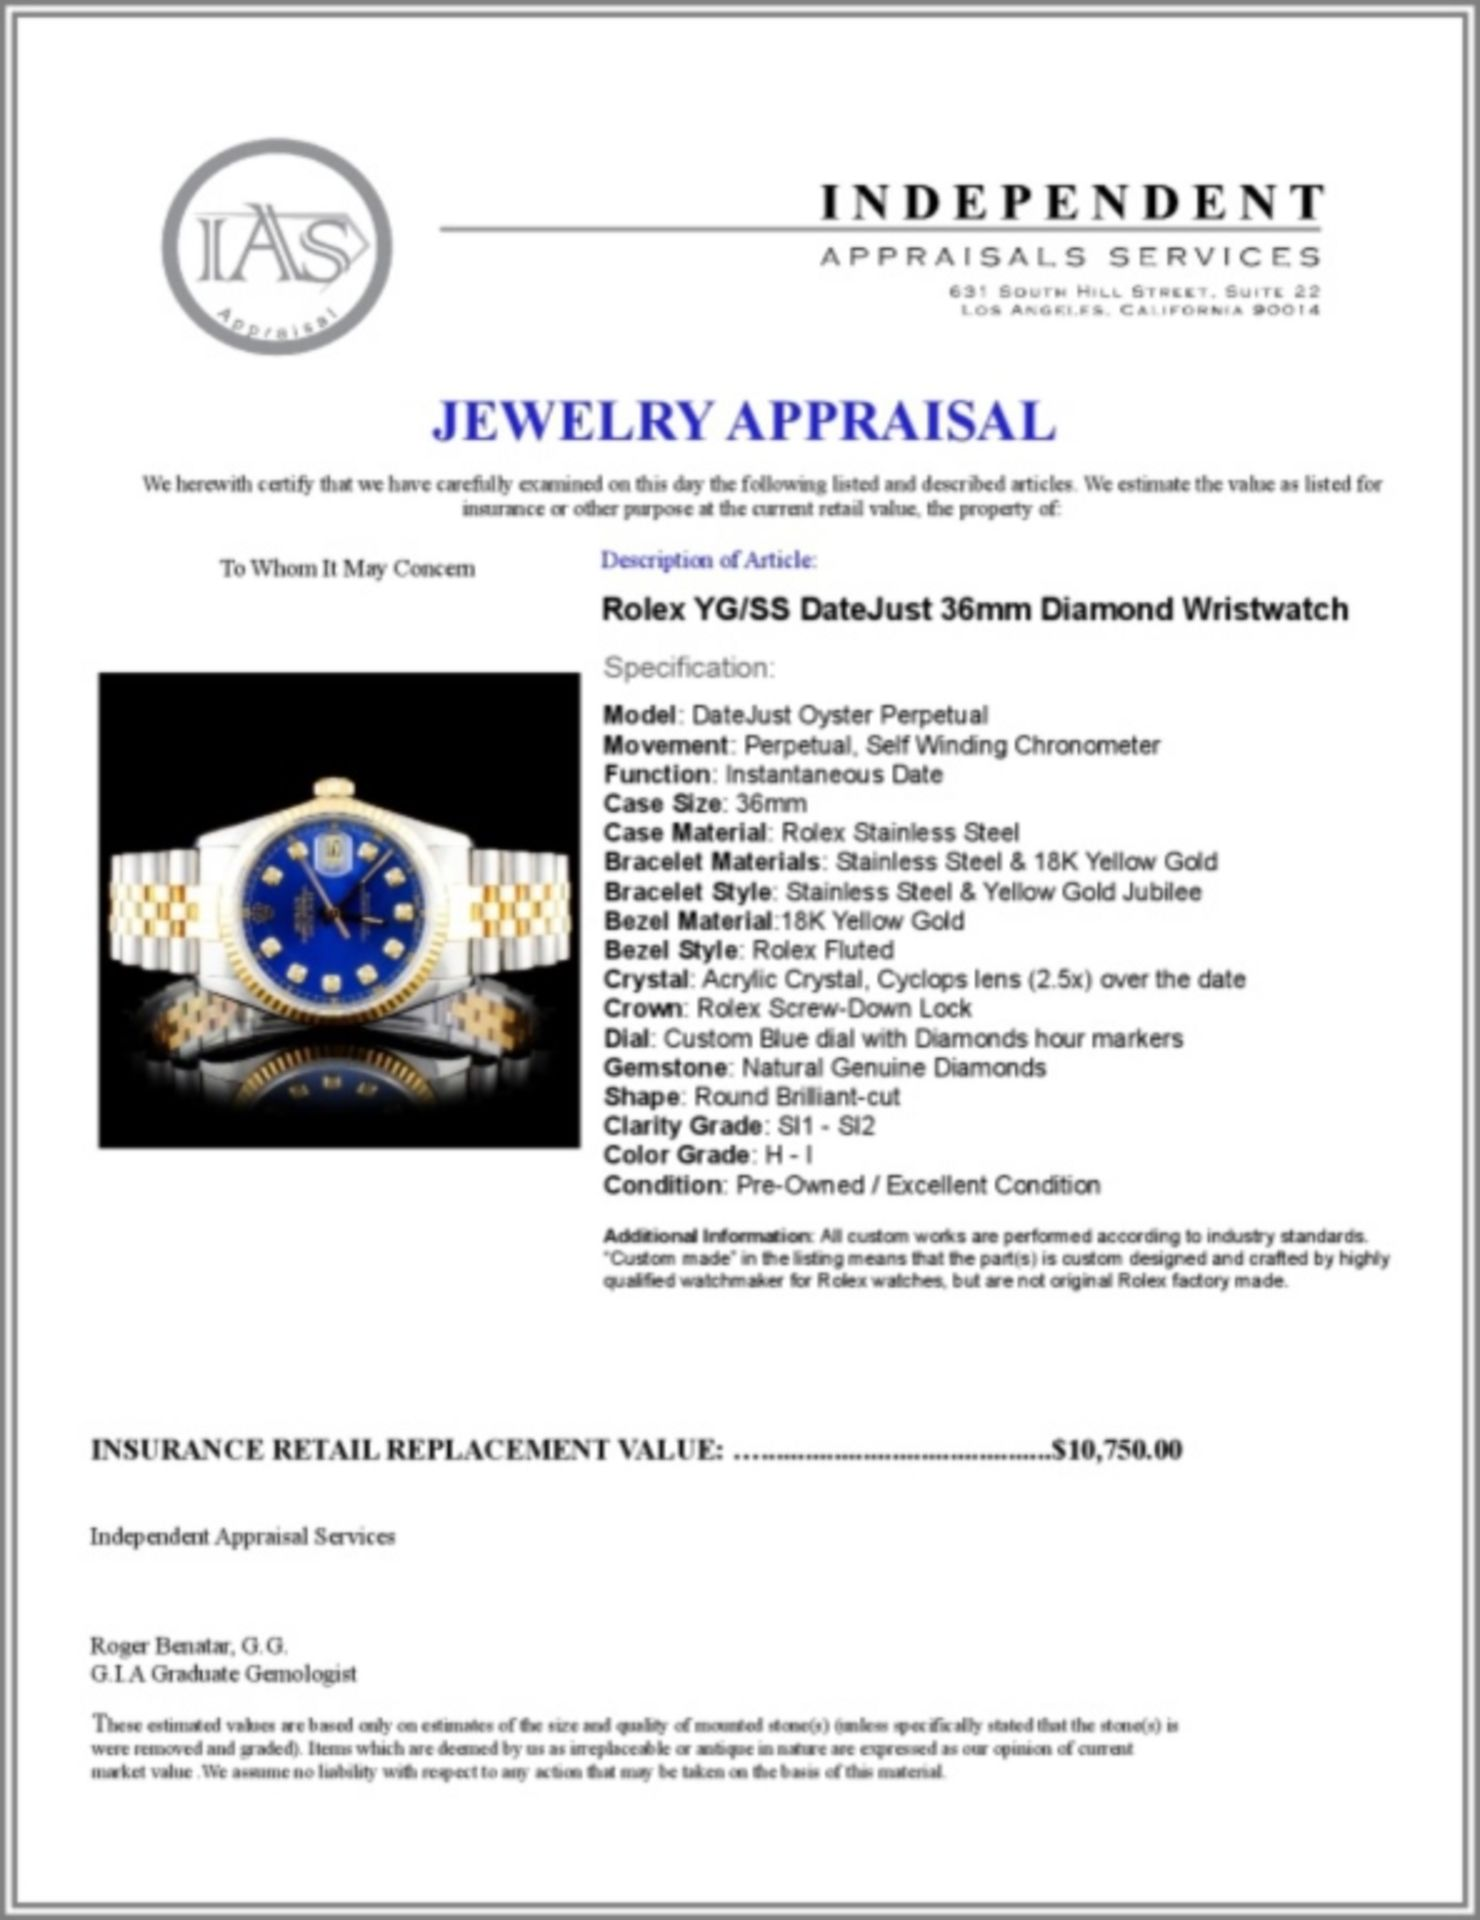 Rolex YG/SS DateJust Diamond 36MM Wristwatch - Image 5 of 5